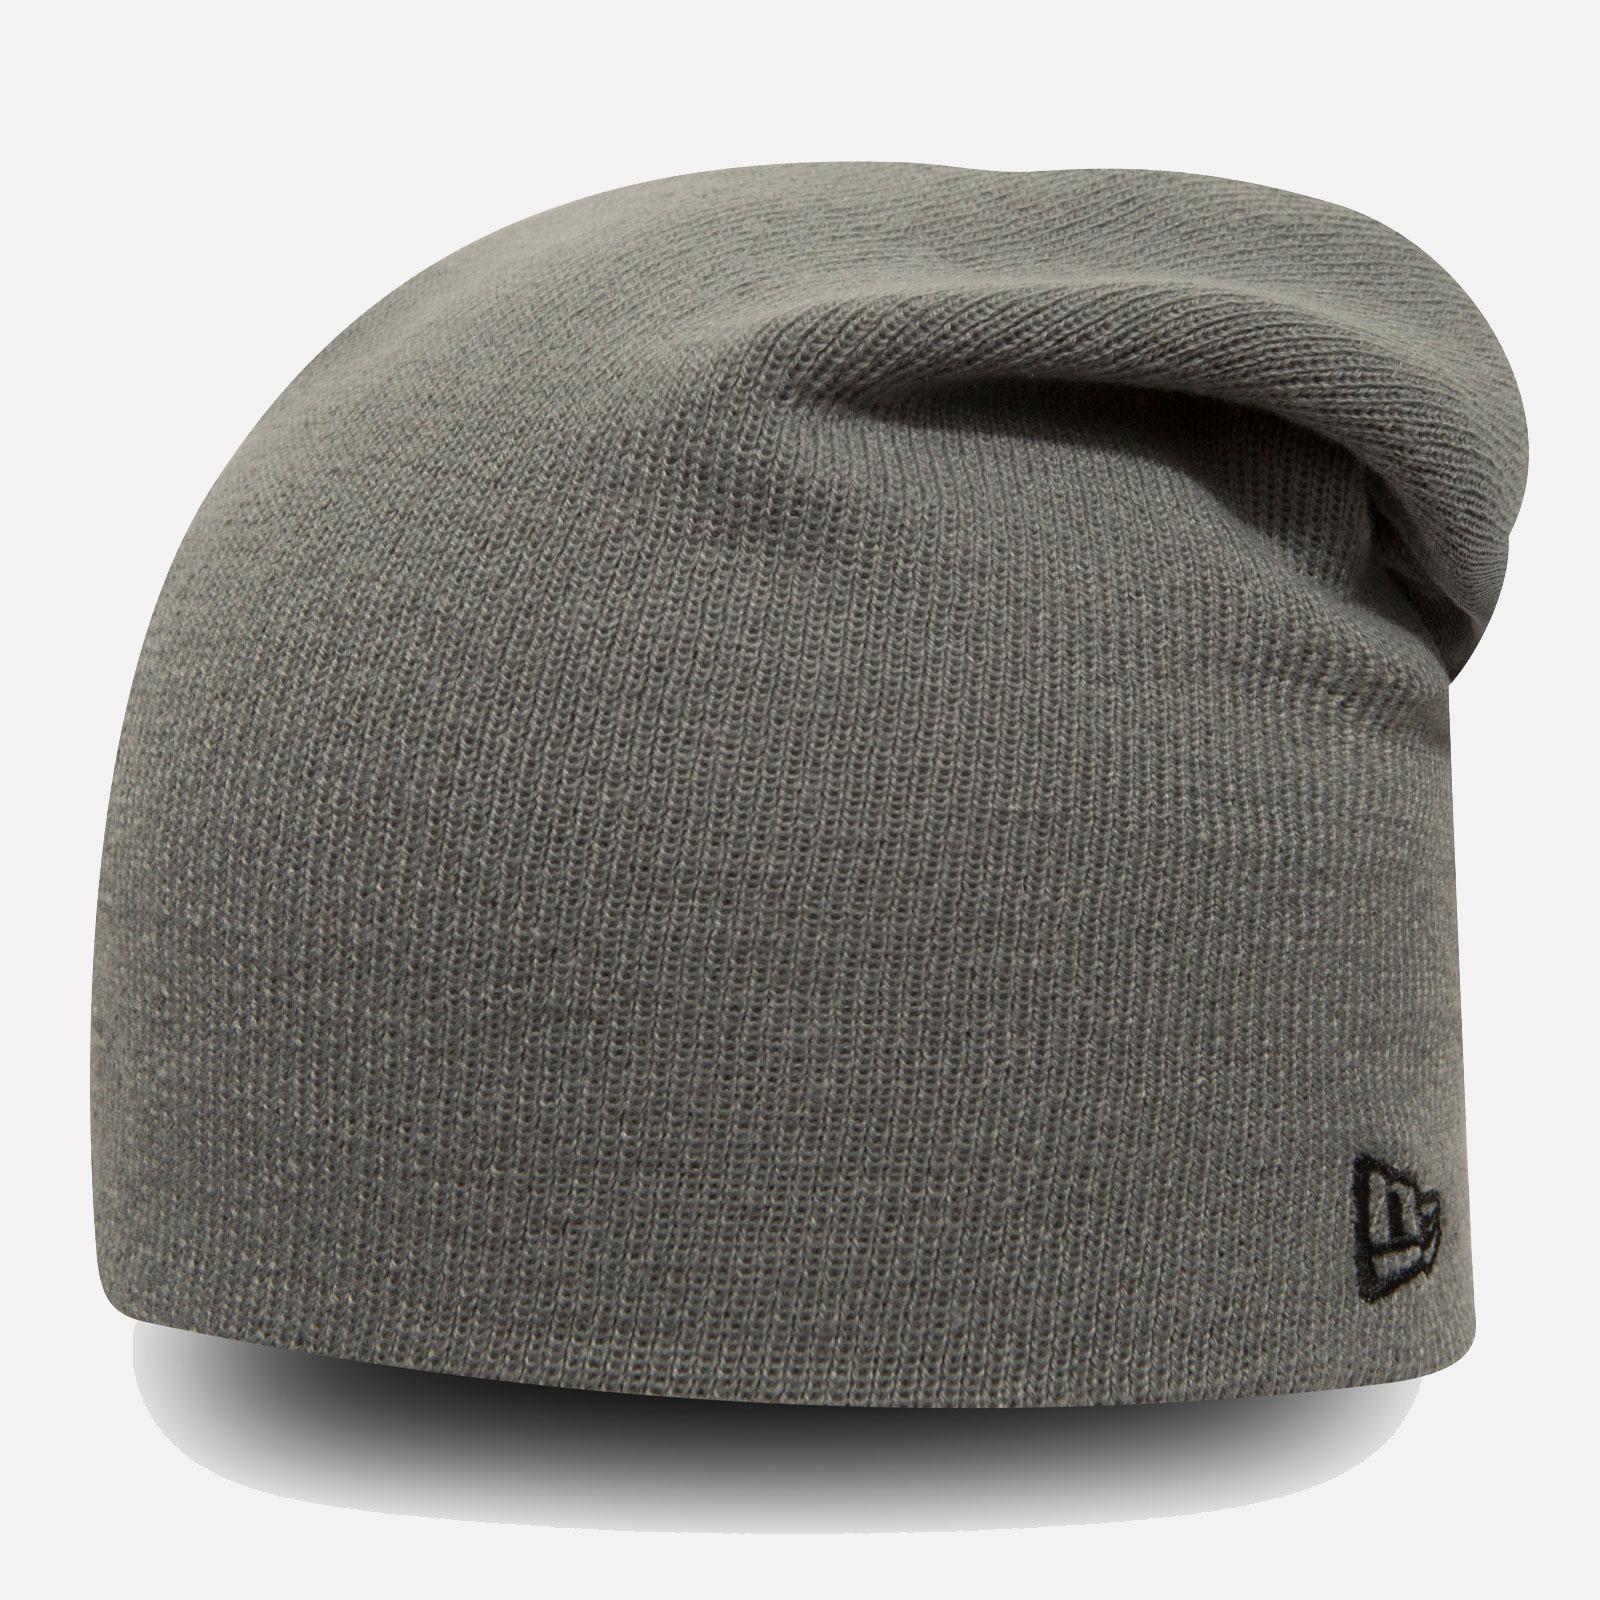 New Era Long Beanie Men s Women s Hat Slouch Trend Skull Knit Unisex ... f1d683a2397d